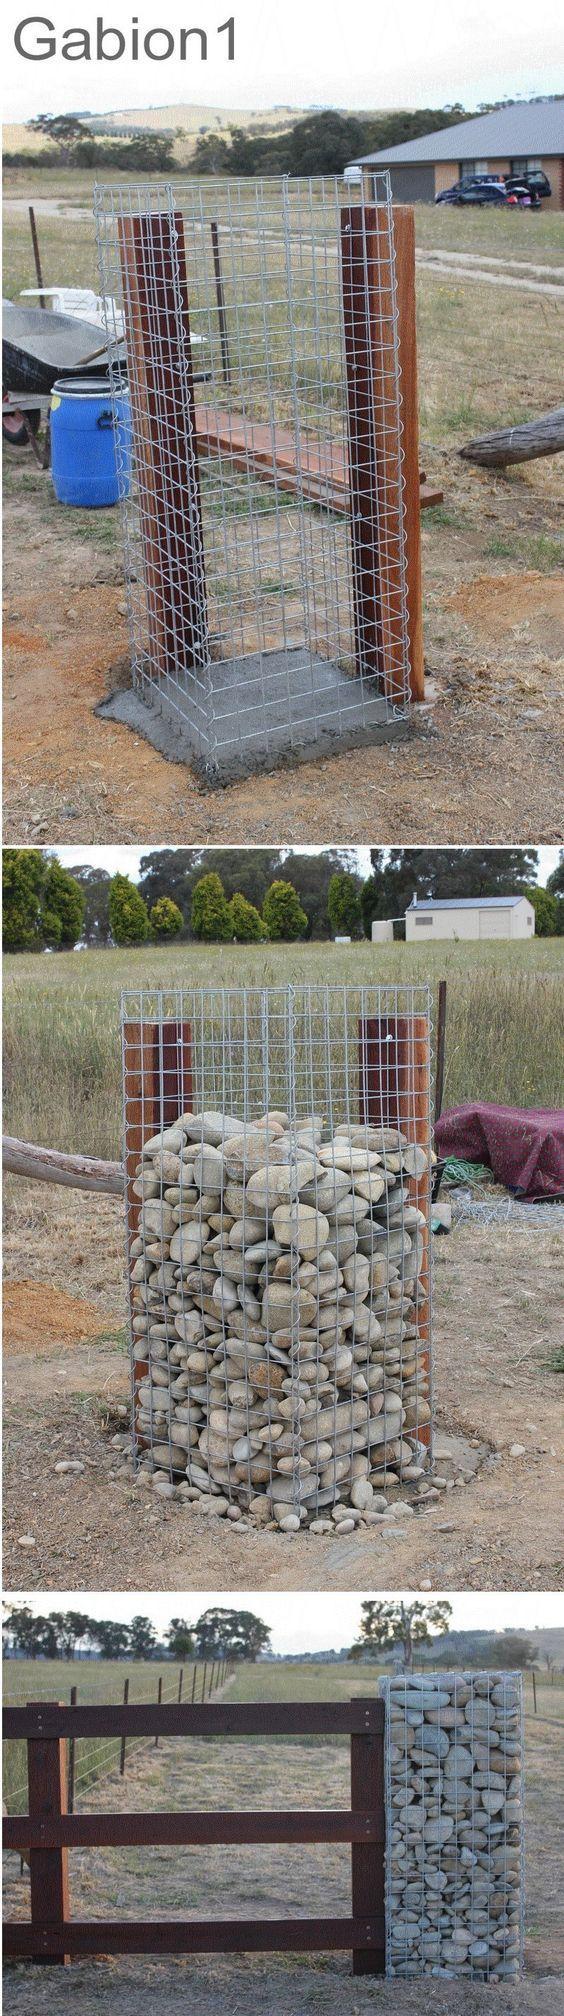 gabion gate column construction sequence http://www.gabion1.com.au: